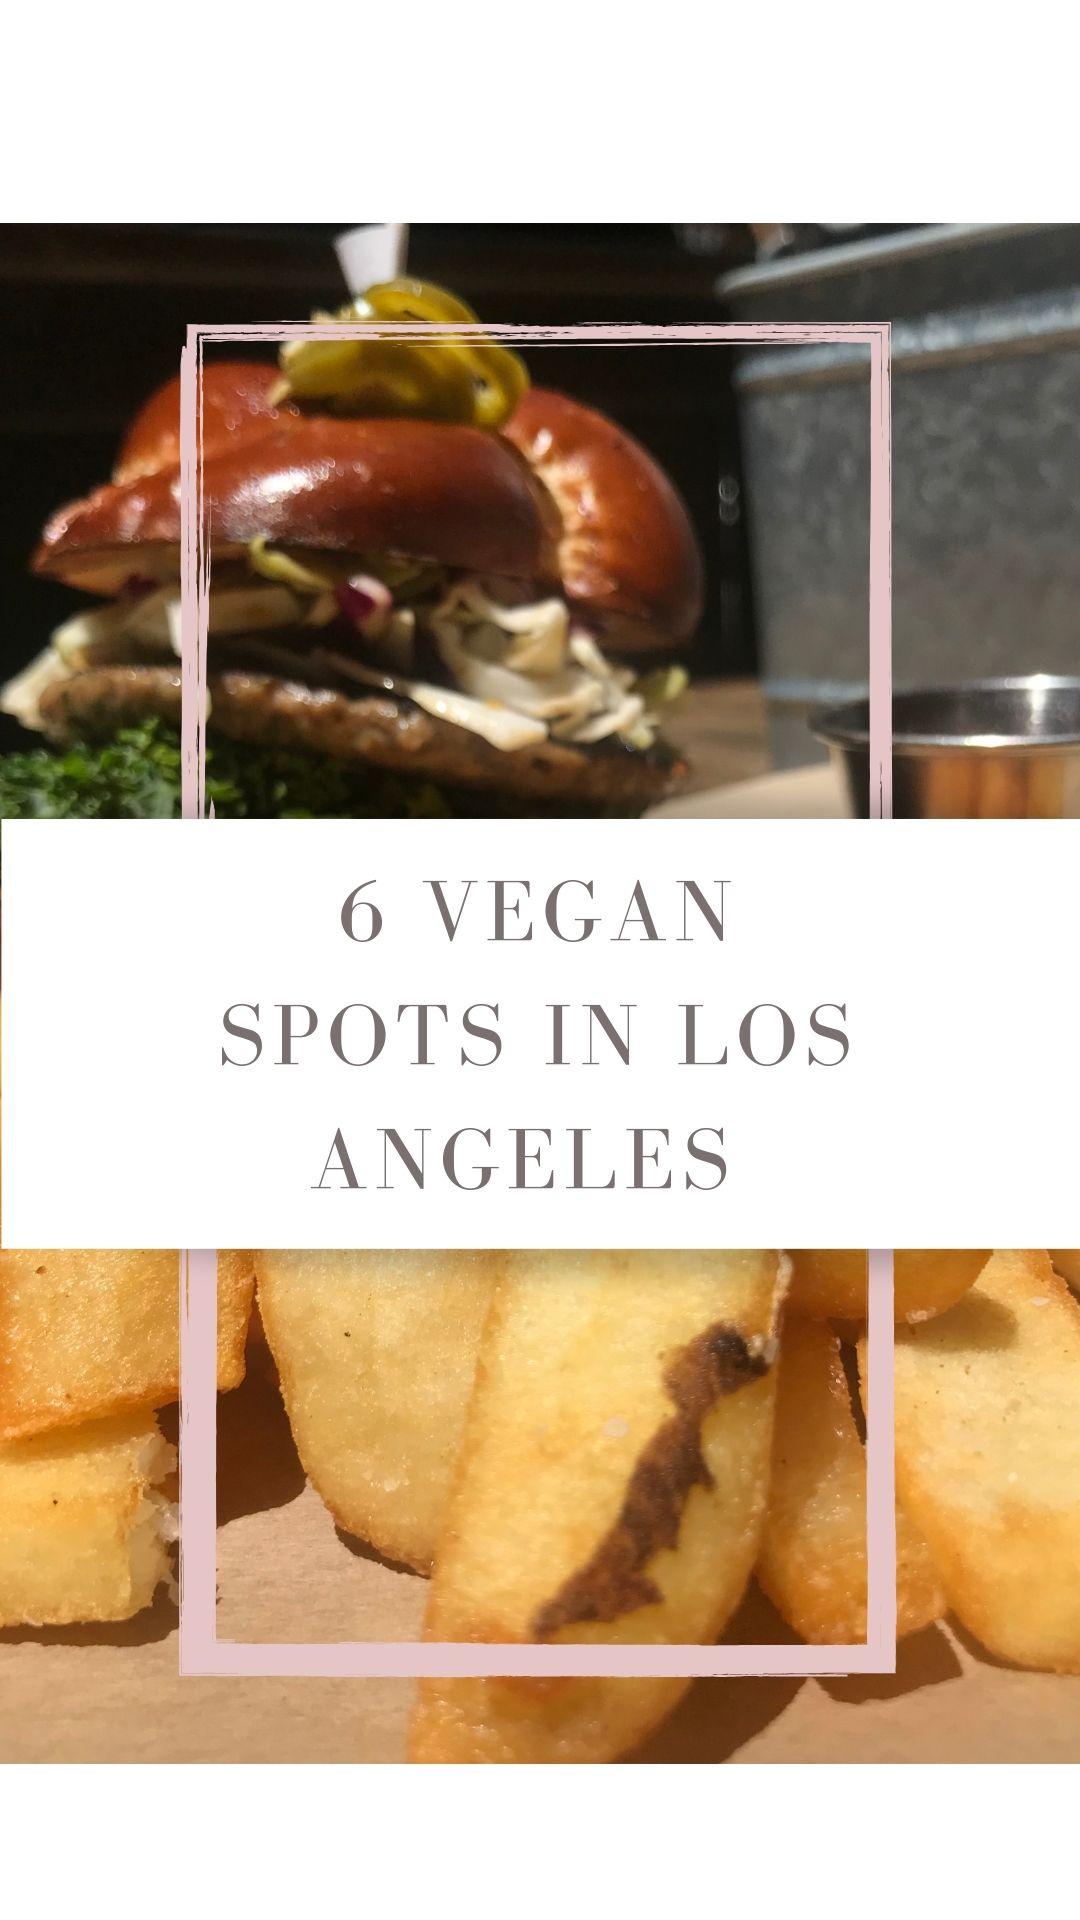 Vegan place, Vegan spots in los Angeles, vegan restaurants in Los Angeles, vegan eats, foodie, vegan food, college vegan